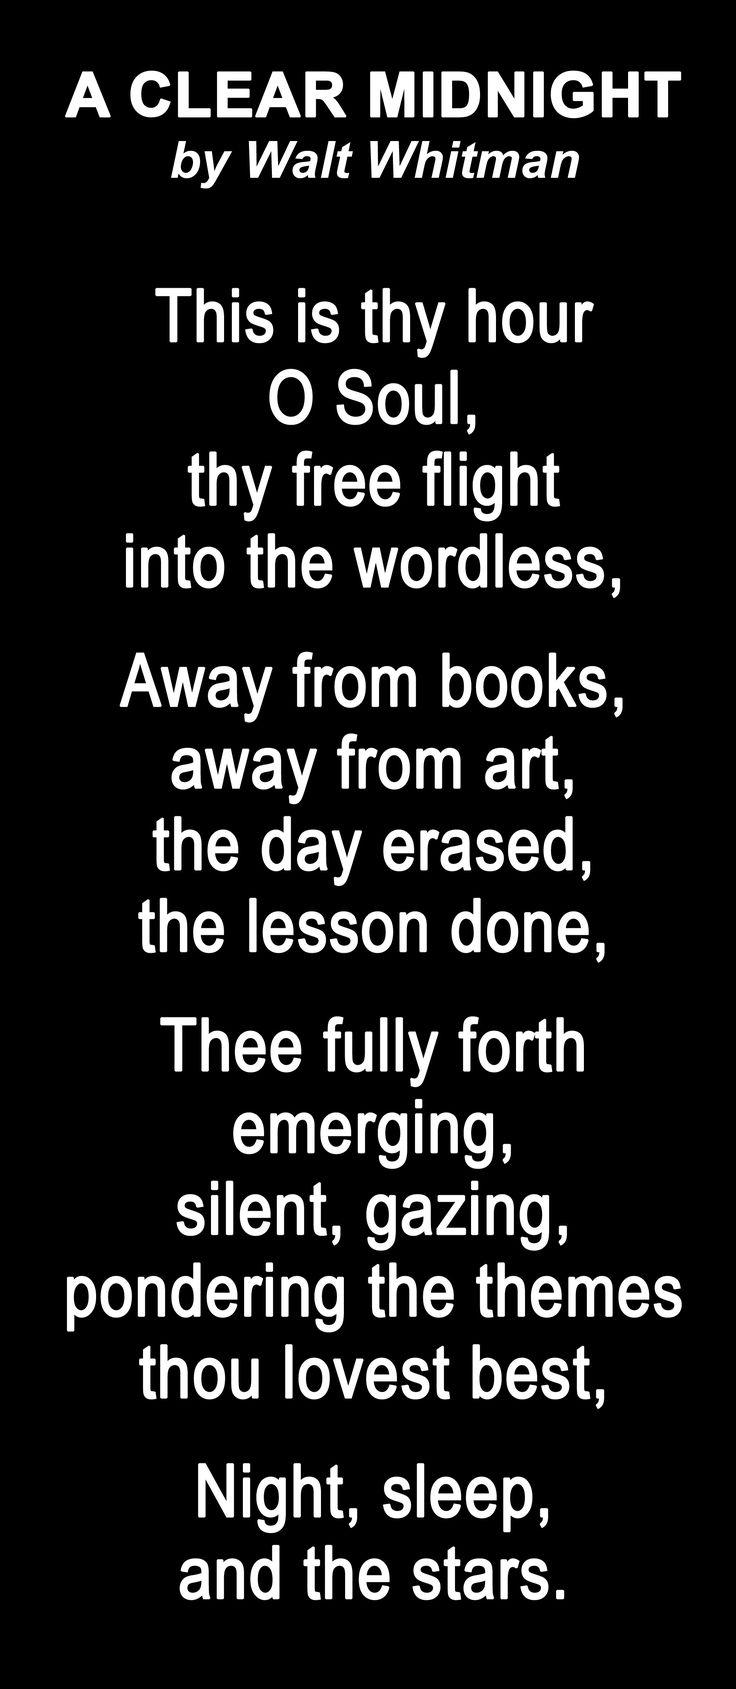 My favorite poem A Clear Midnight - Walt Whitman